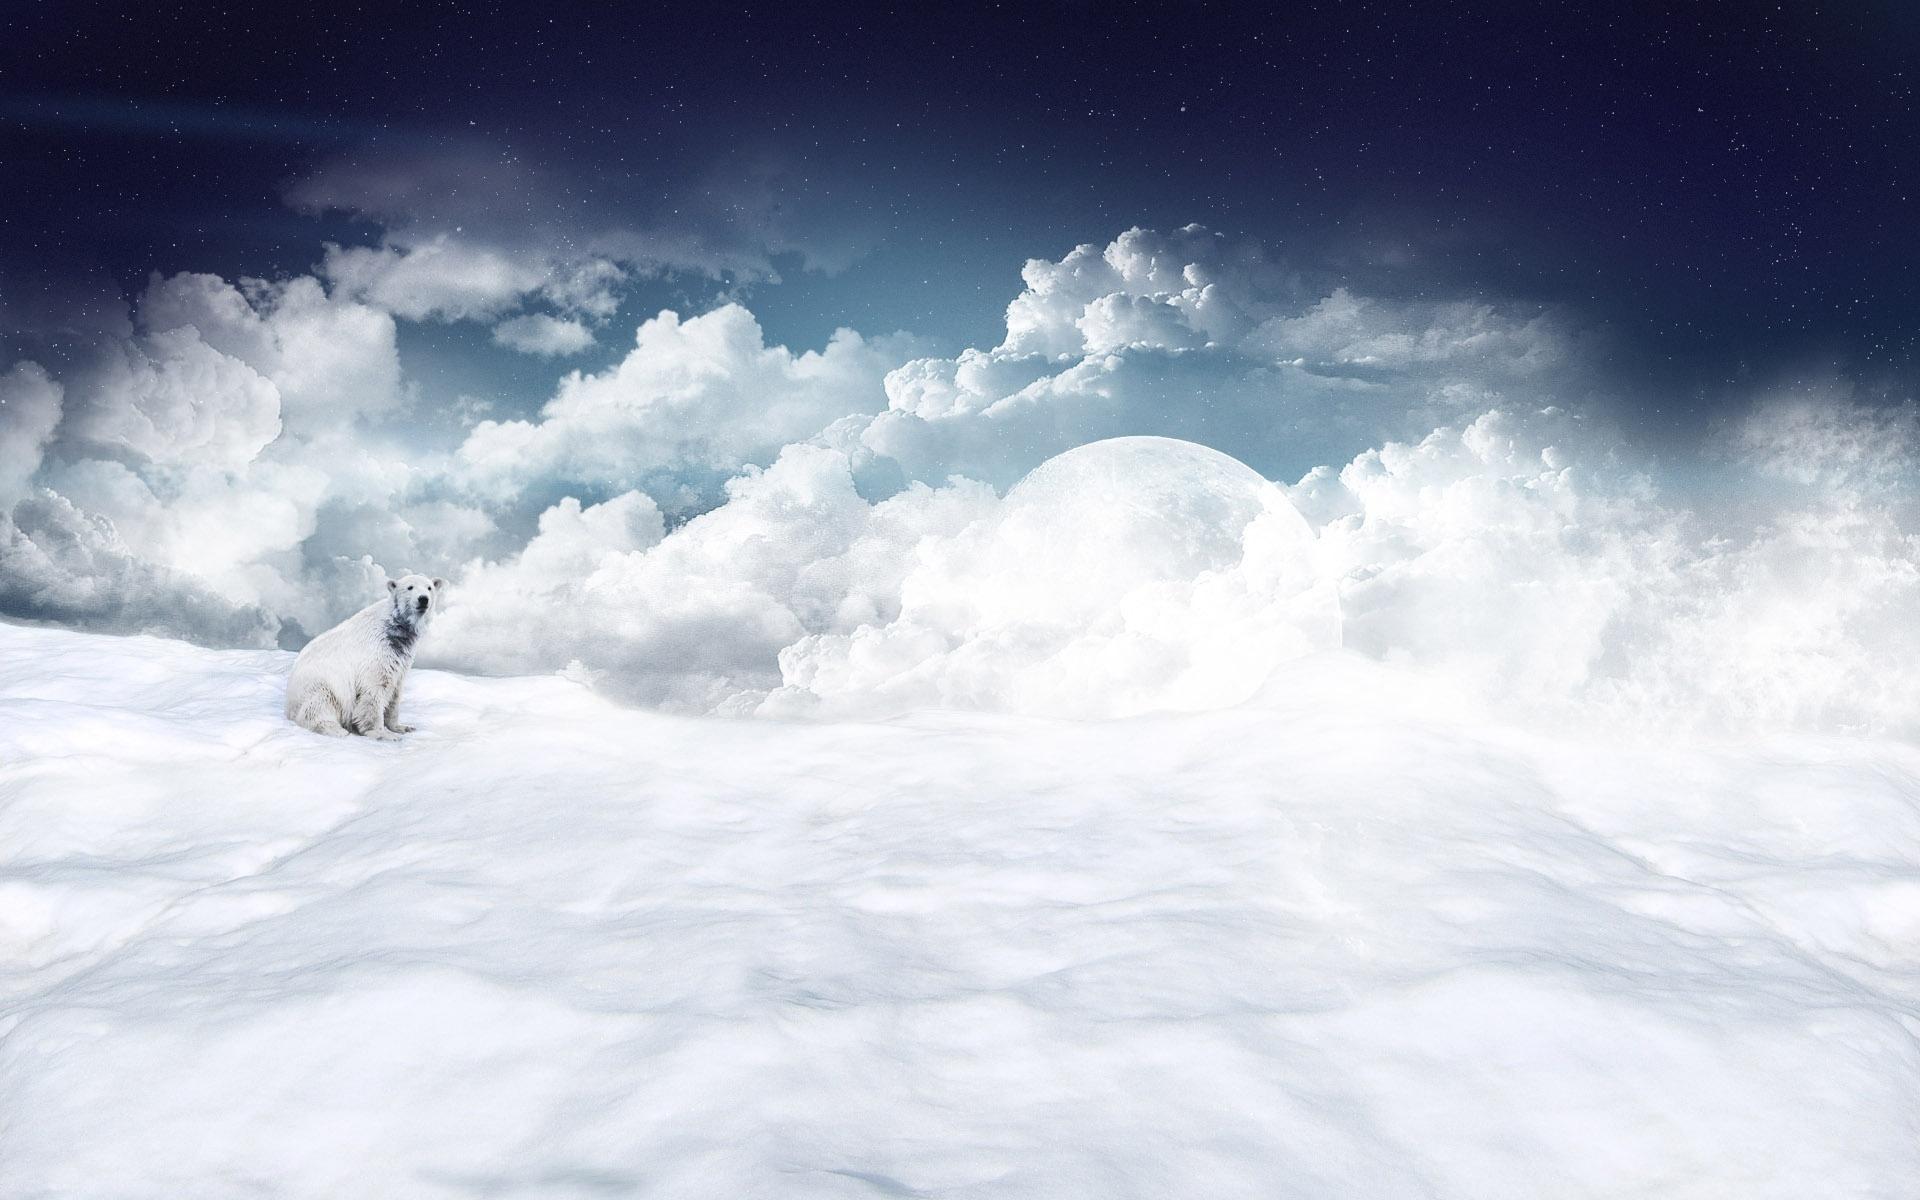 Oso Polar en las nubes